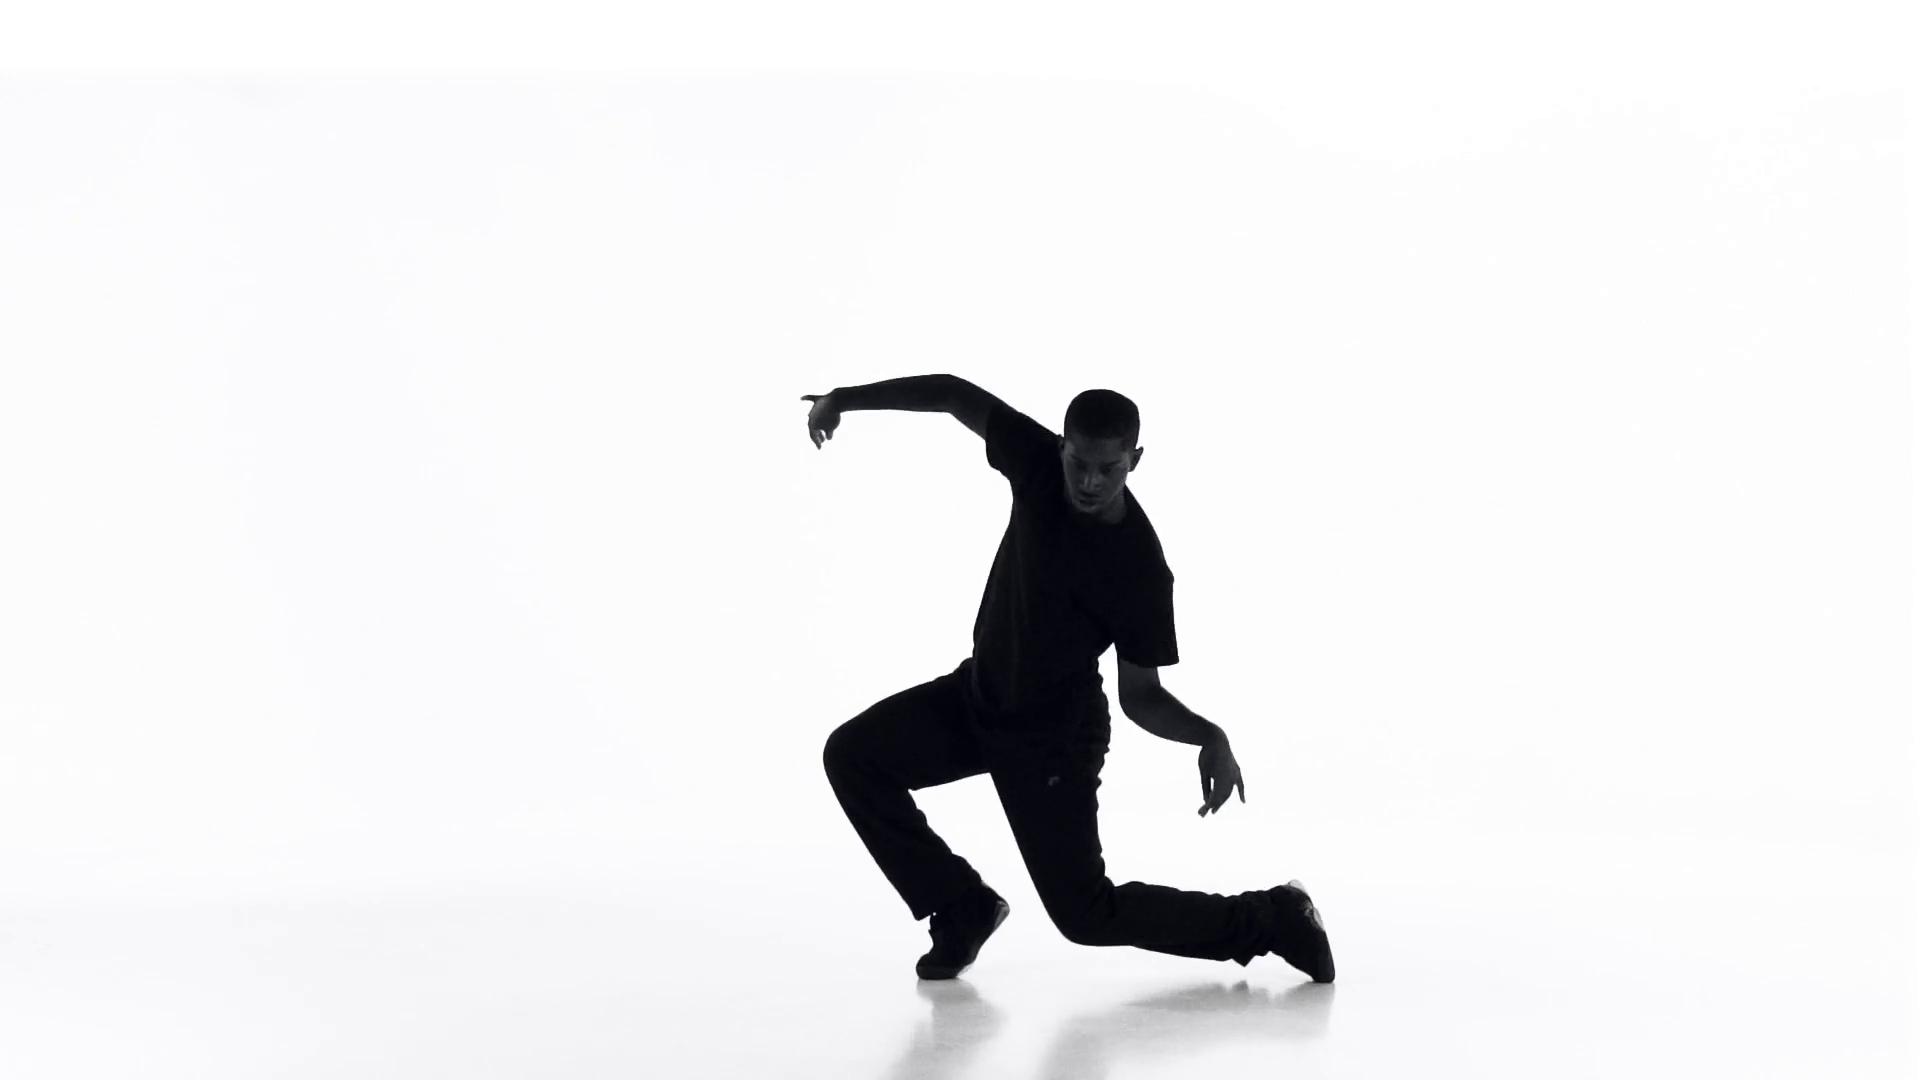 1920x1080 Street Dancing Silhouette 06 Stock Video Footage